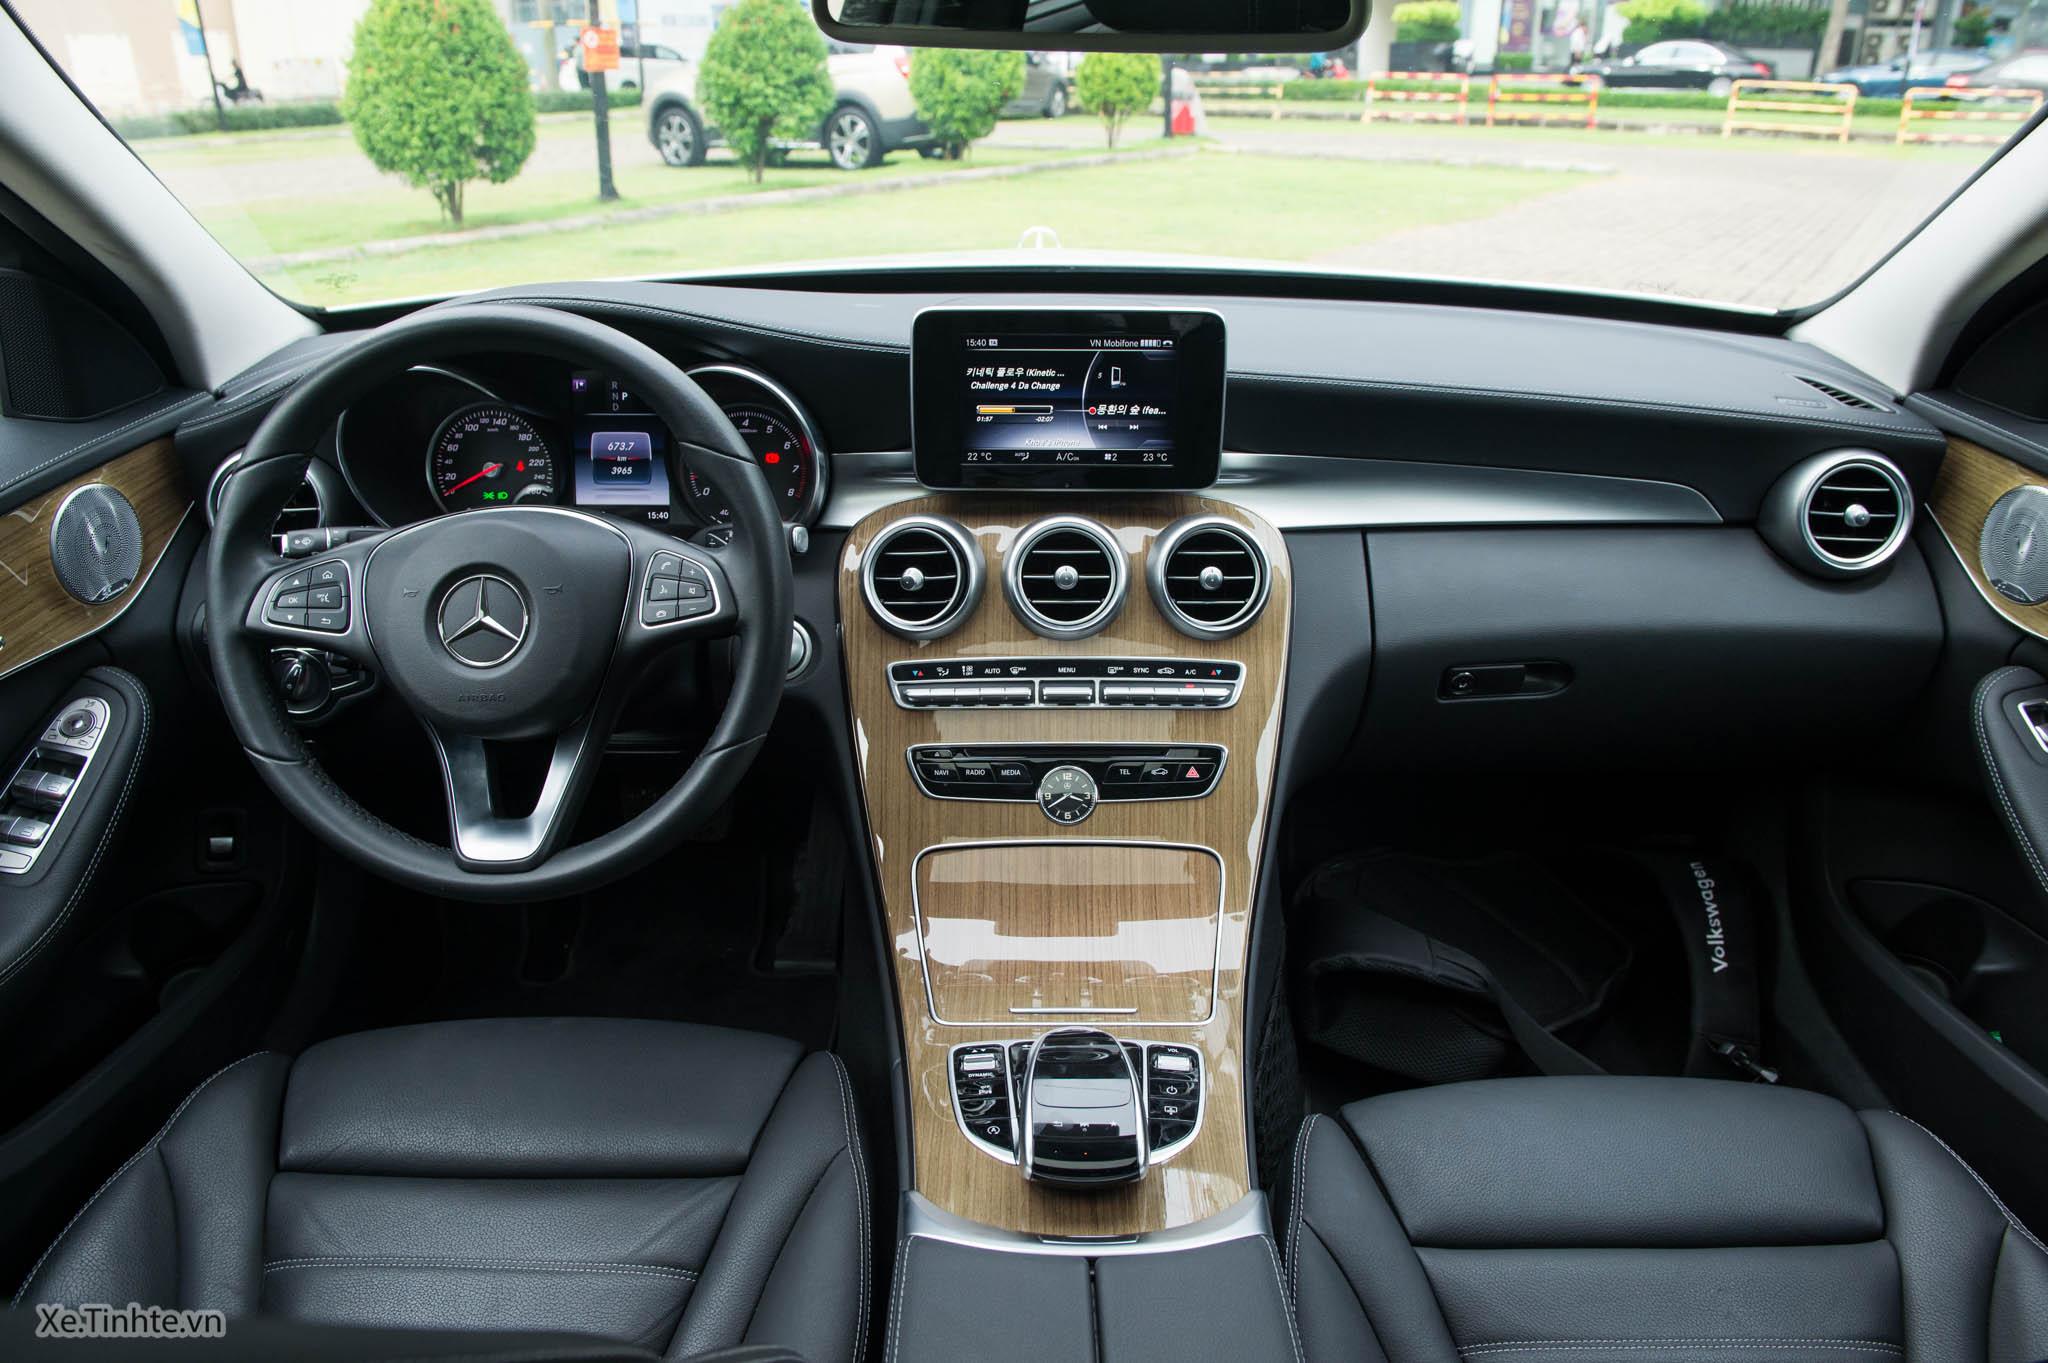 Mercedes_C250 Exclusive_Xe.tinhte.vn-7244.jpg